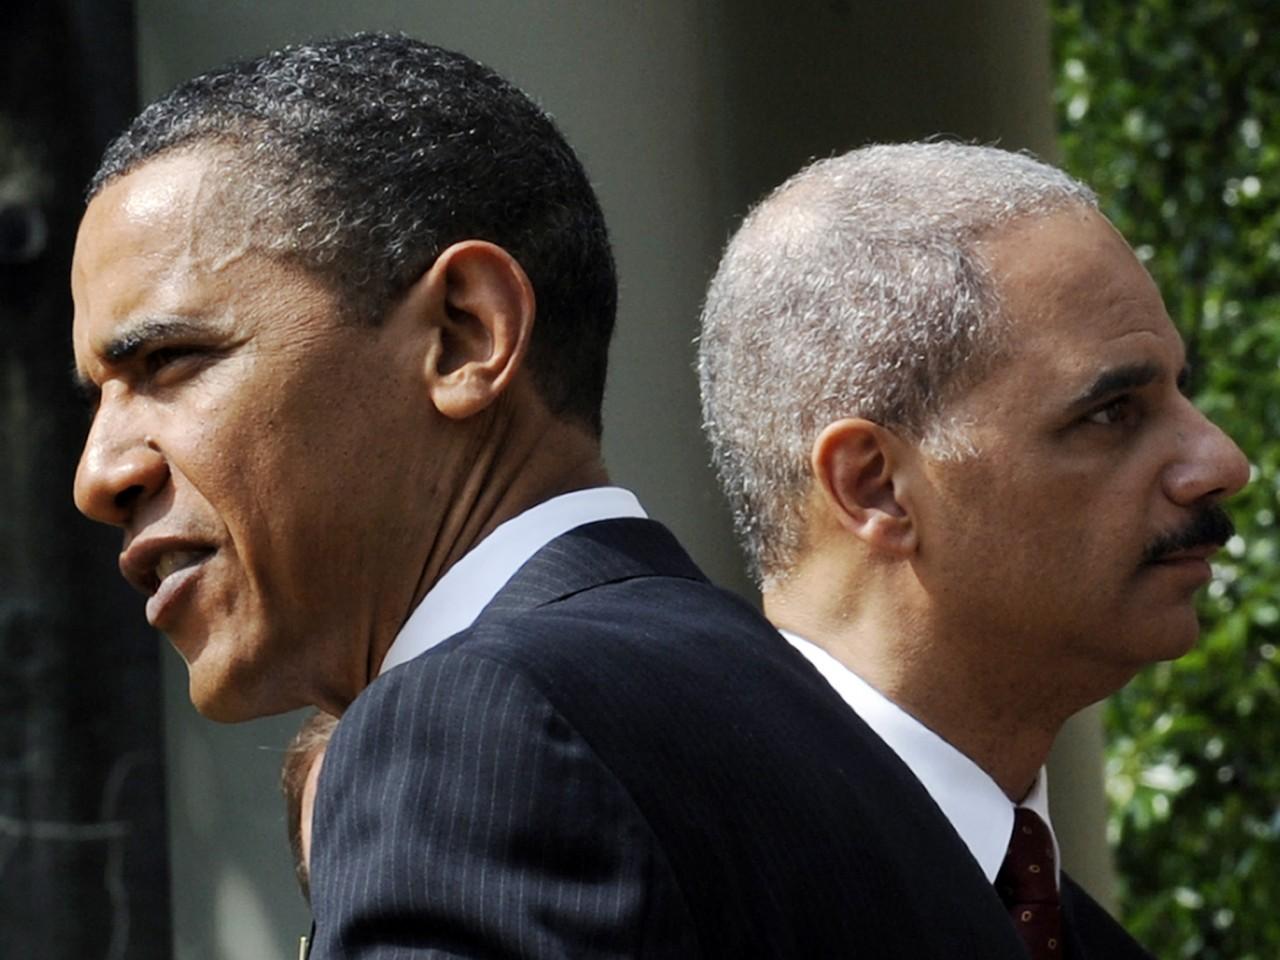 obama_admin_keeps_views_on_miranda_secret-1280x960